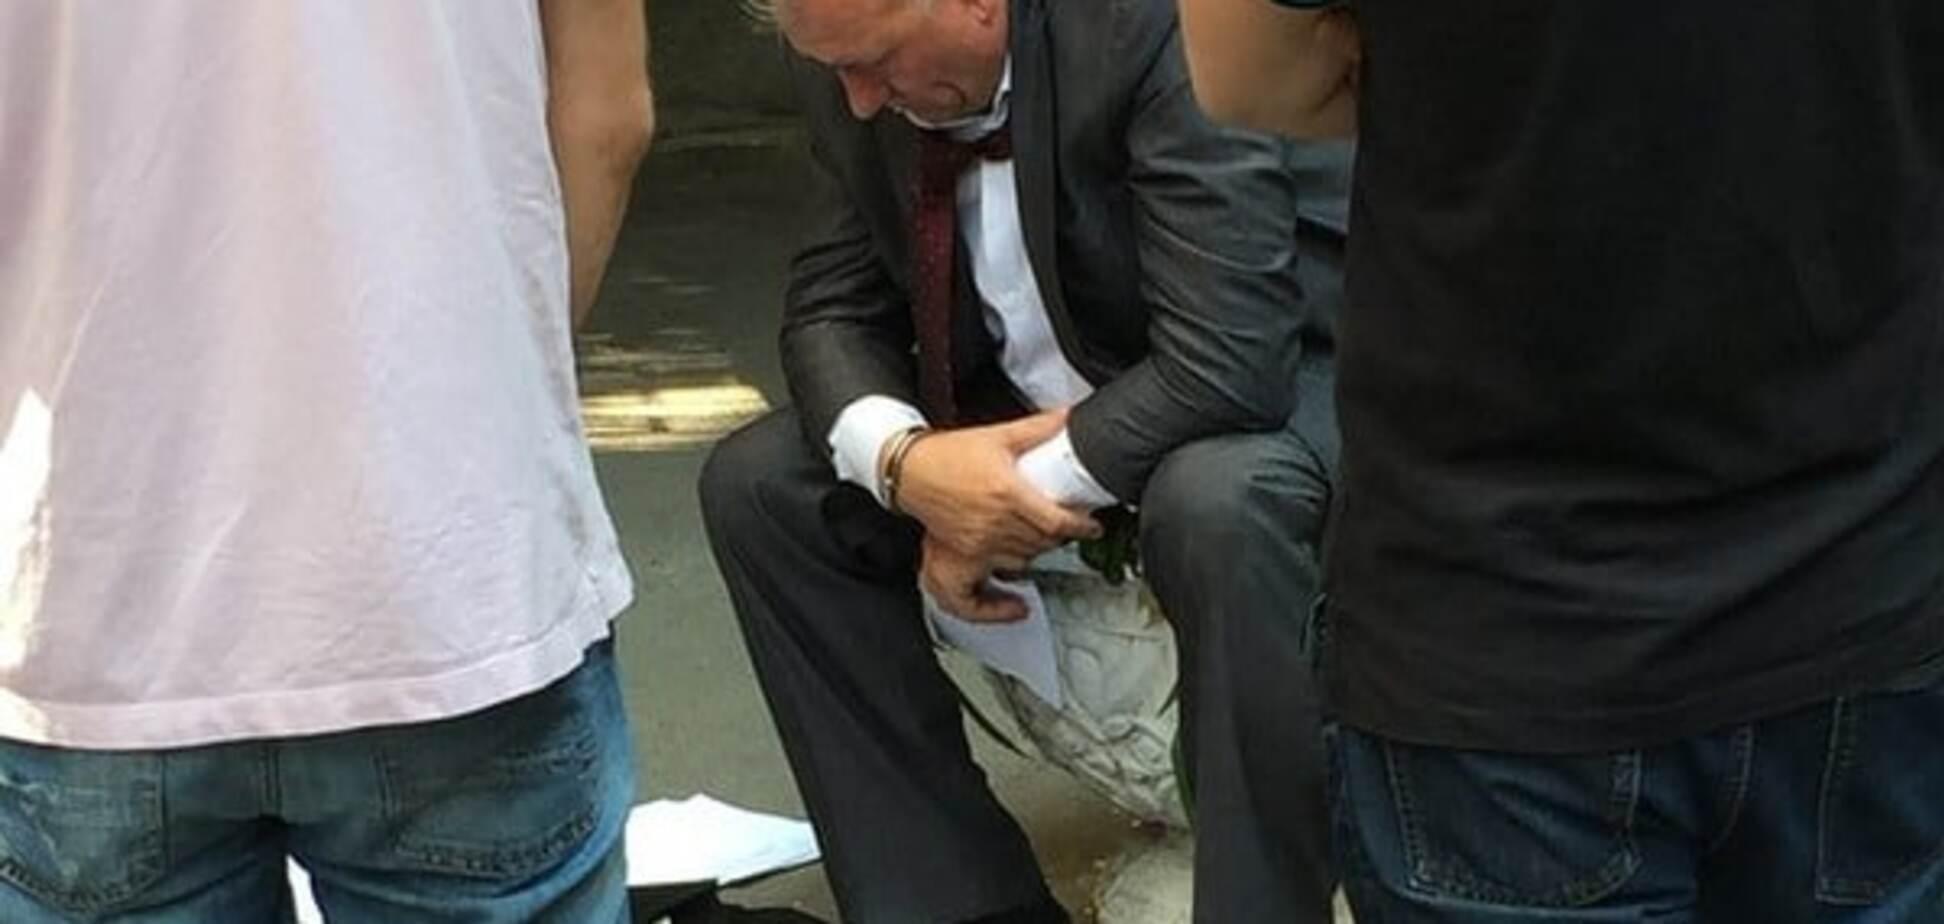 В Киеве возле Администрации президента задержали взяточника - нардеп